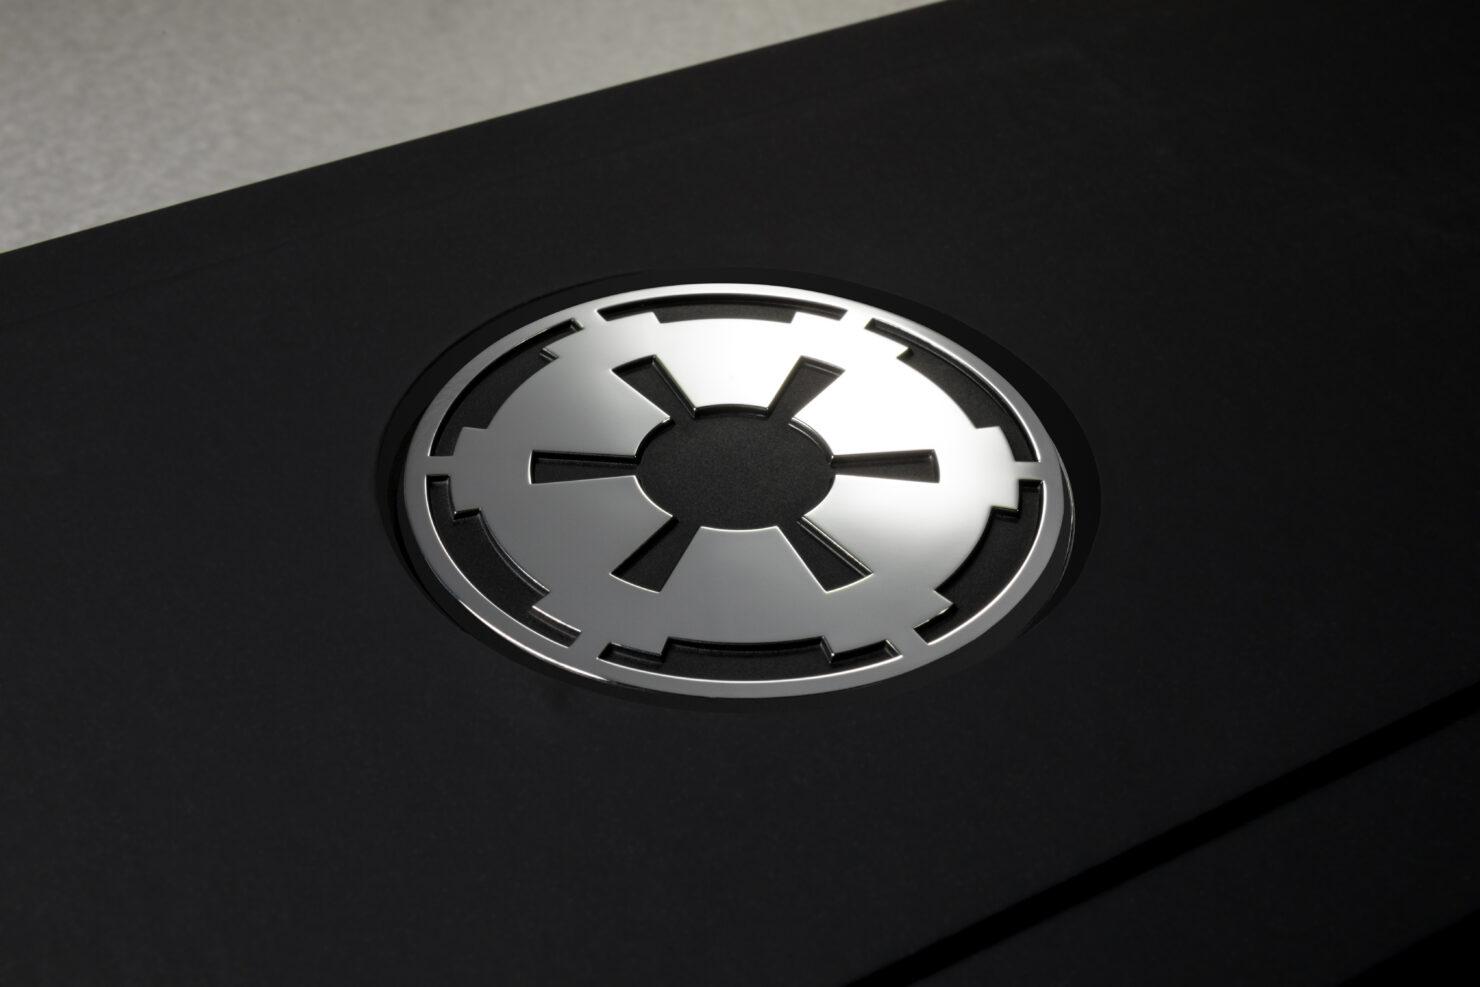 nvidia-geforce-titan-xp-star-wars-collectors-edition-galactic-empire-packaging-photo-004